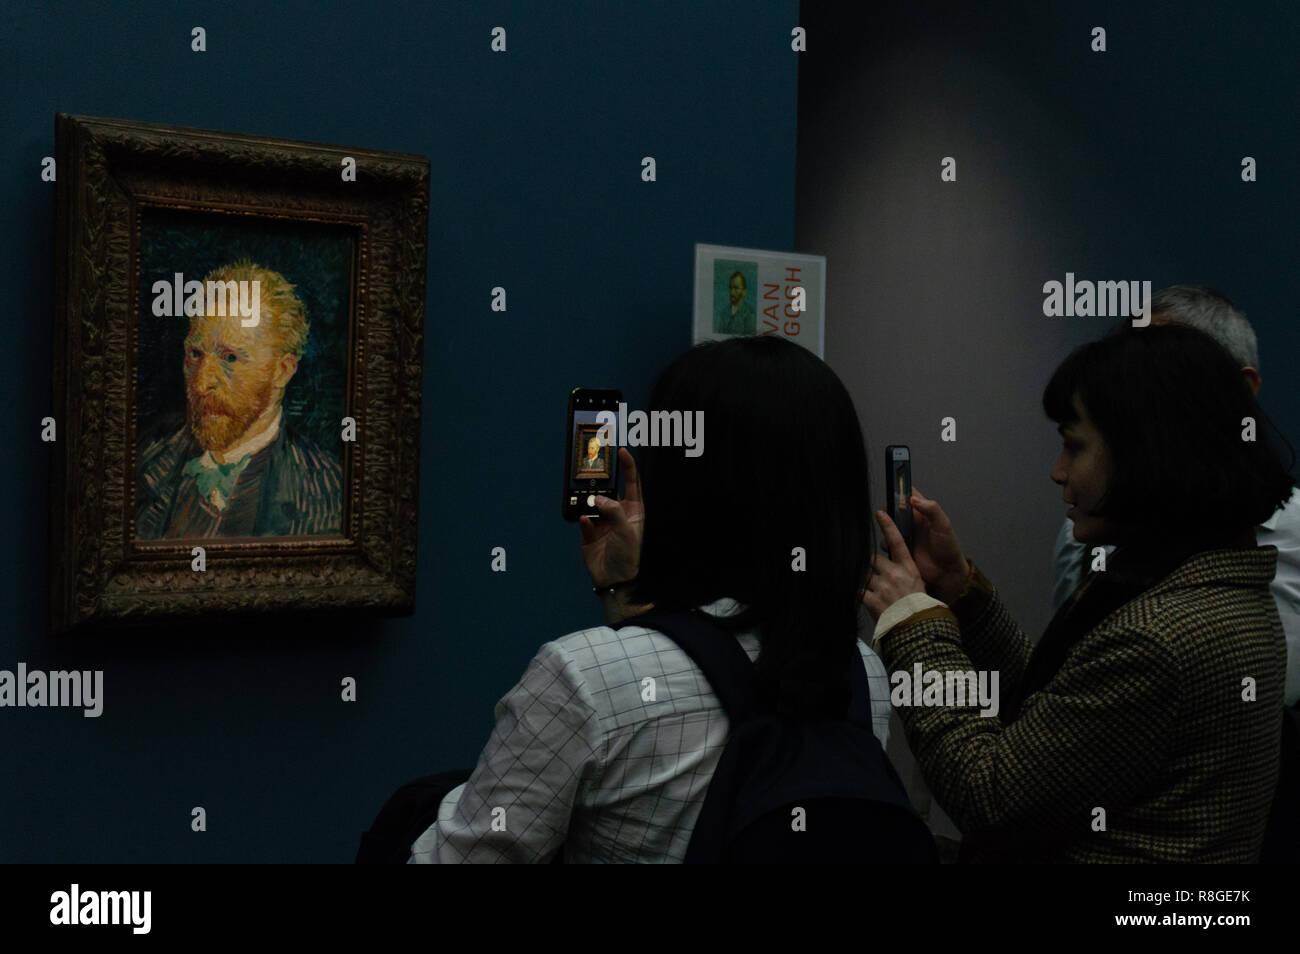 Visitors in front of Vincent Van Gogh's 'Portrait de l'artiste' (Portrait of the artist), one of the famous Dutch painter's autoportraits displayed in - Stock Image